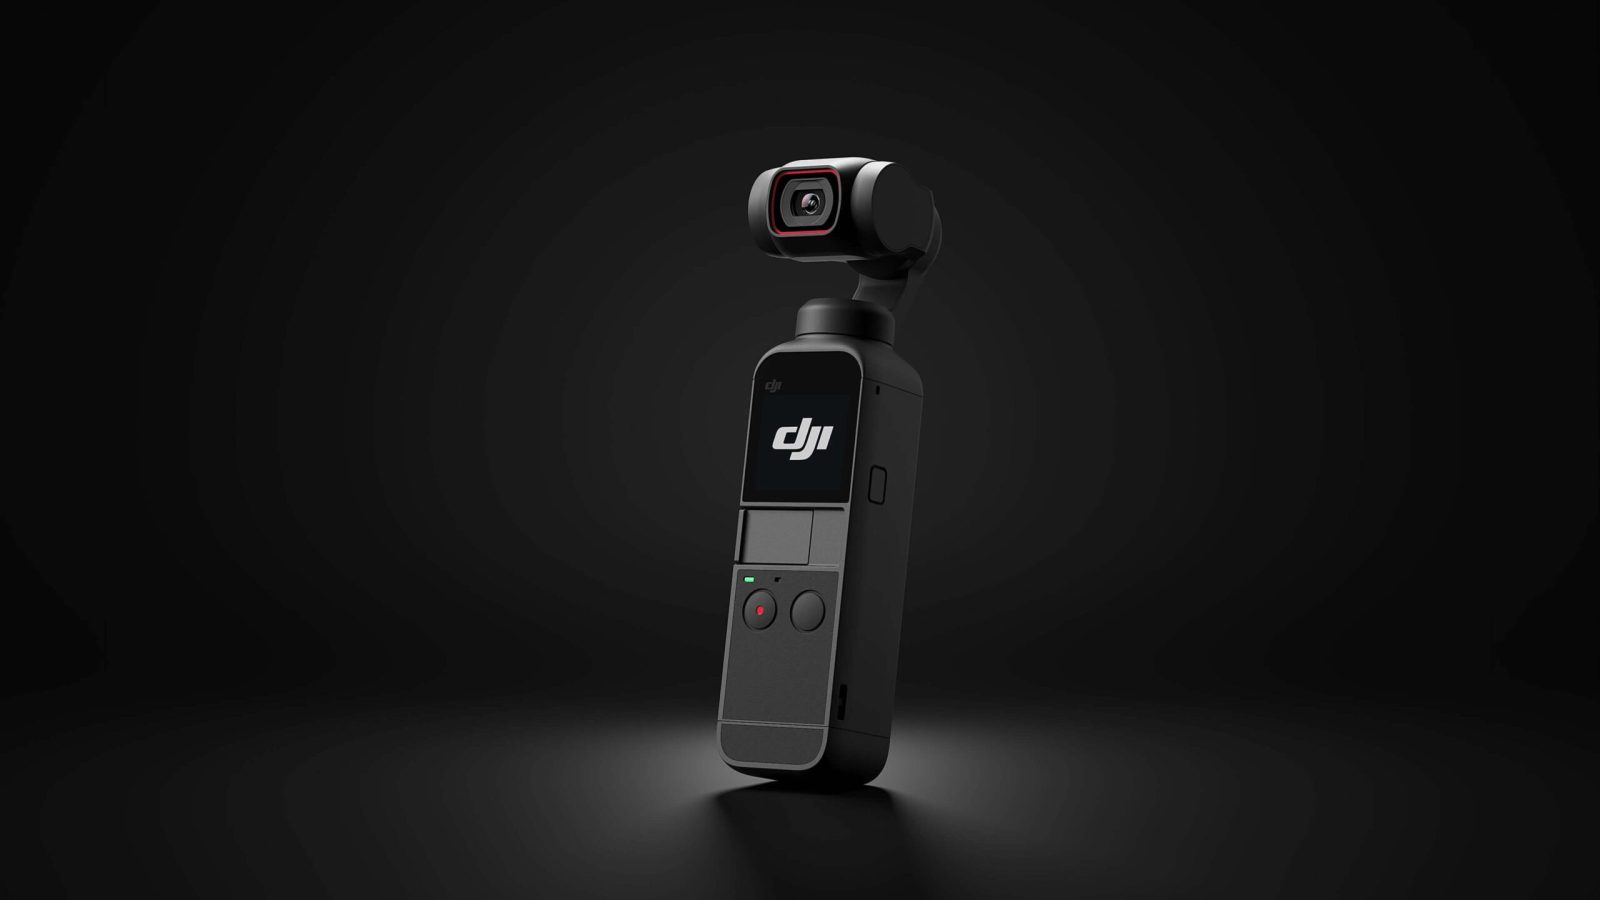 DJI Pocket 2: The Smallest Stabilized Mini 4K Camera